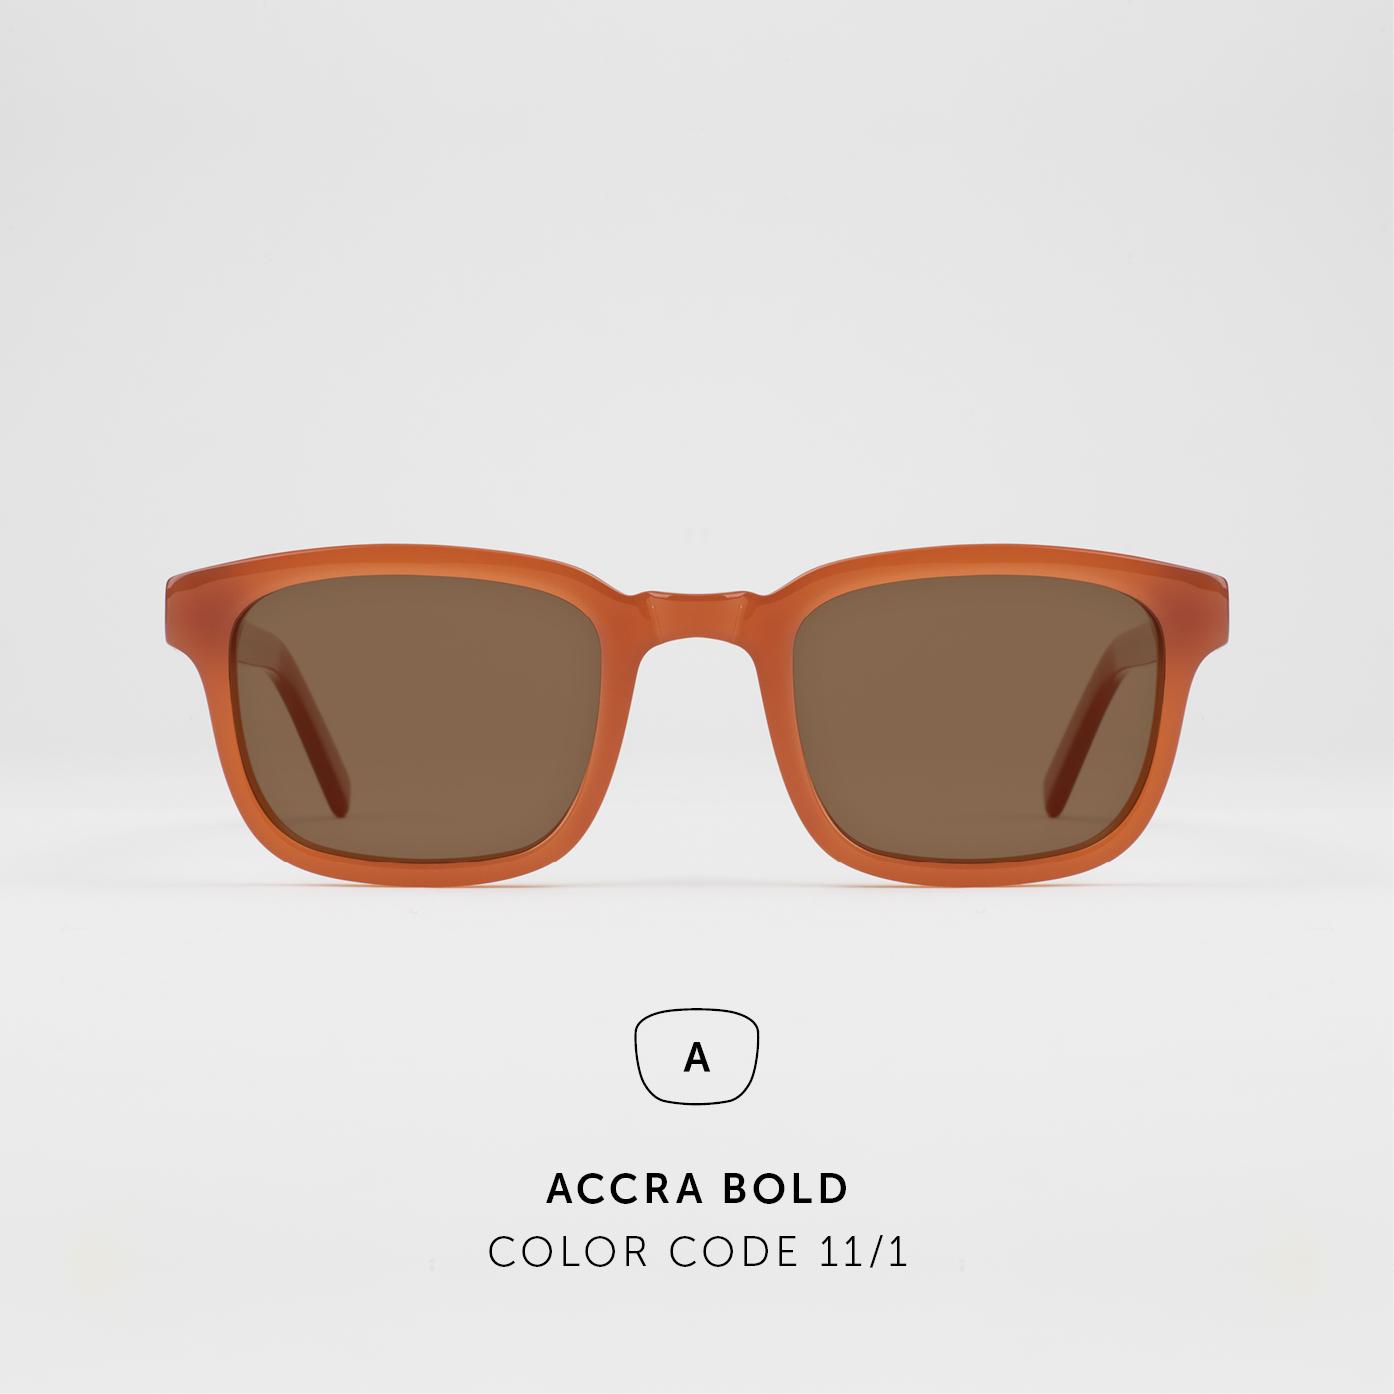 AccraBold34.jpg